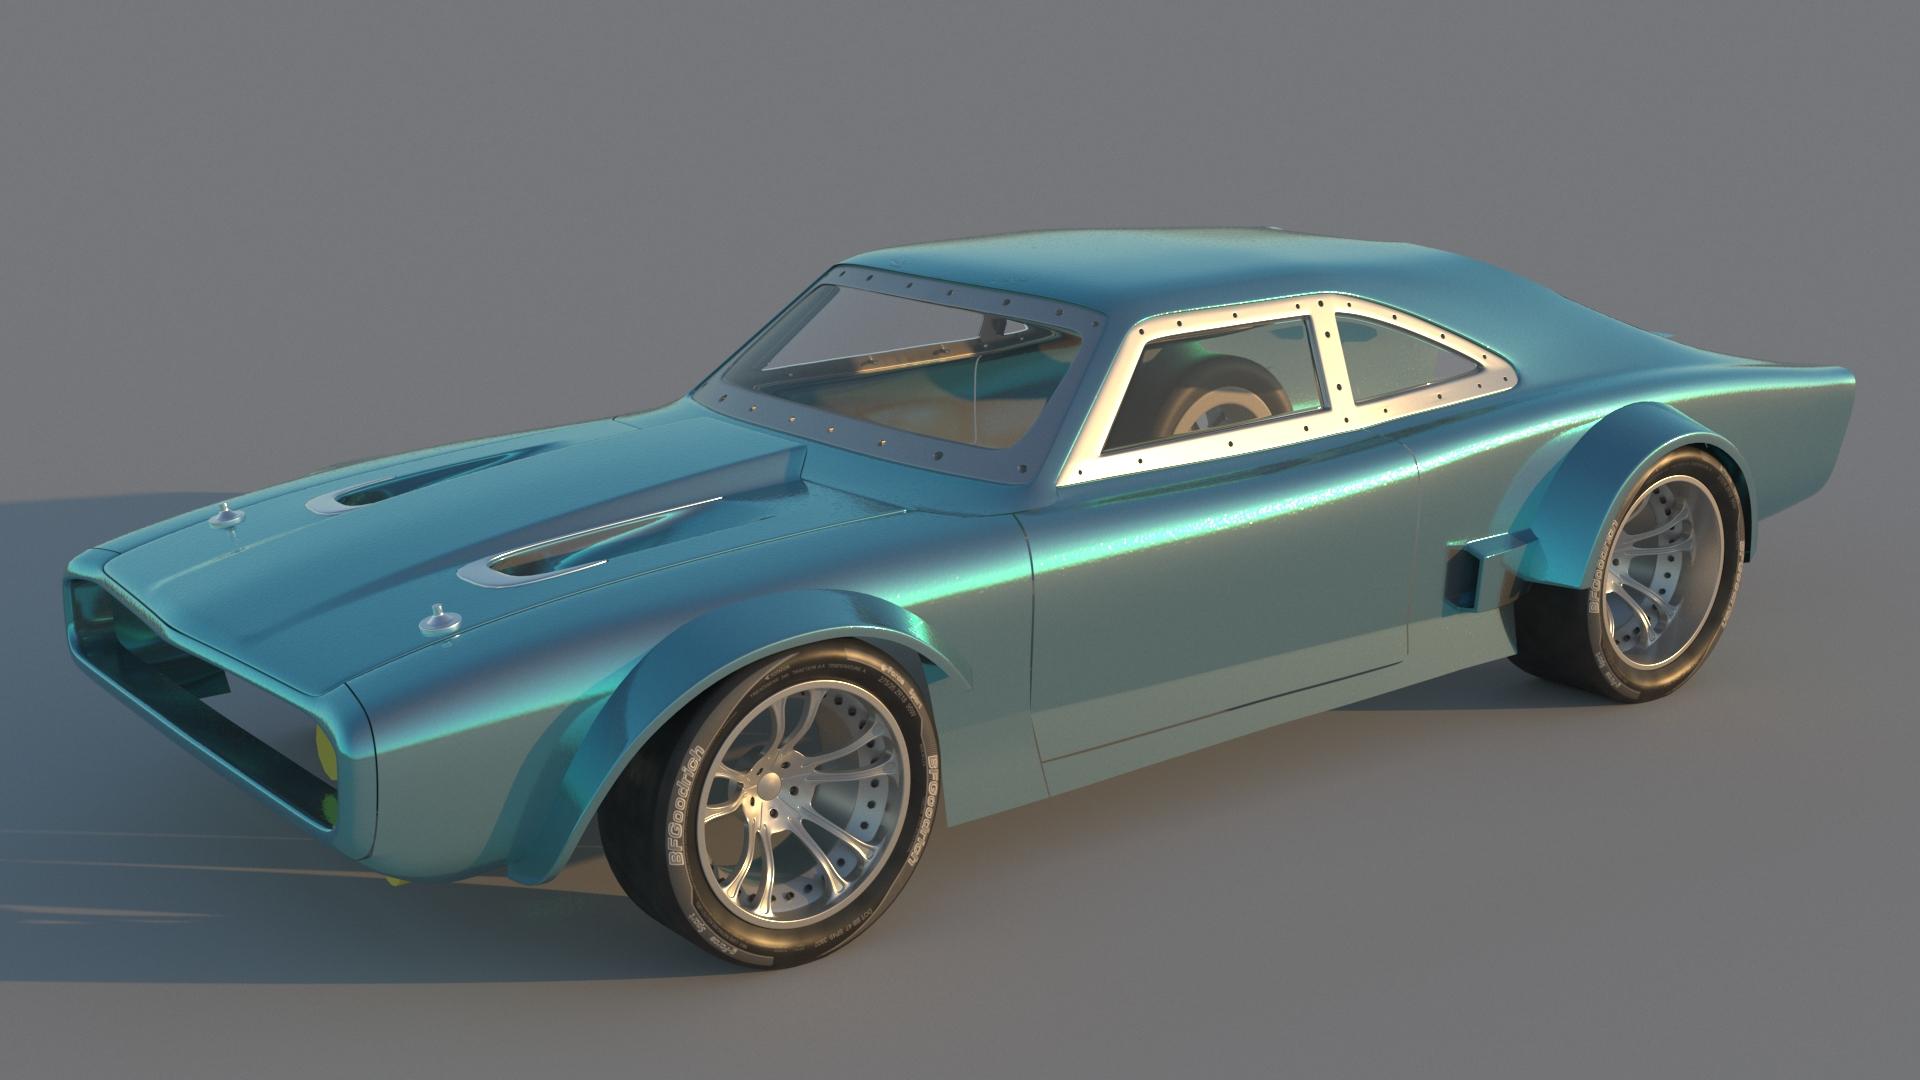 2018 Car Render Challenge - Dom's Ice Charger FF8 (Hector Suriel)